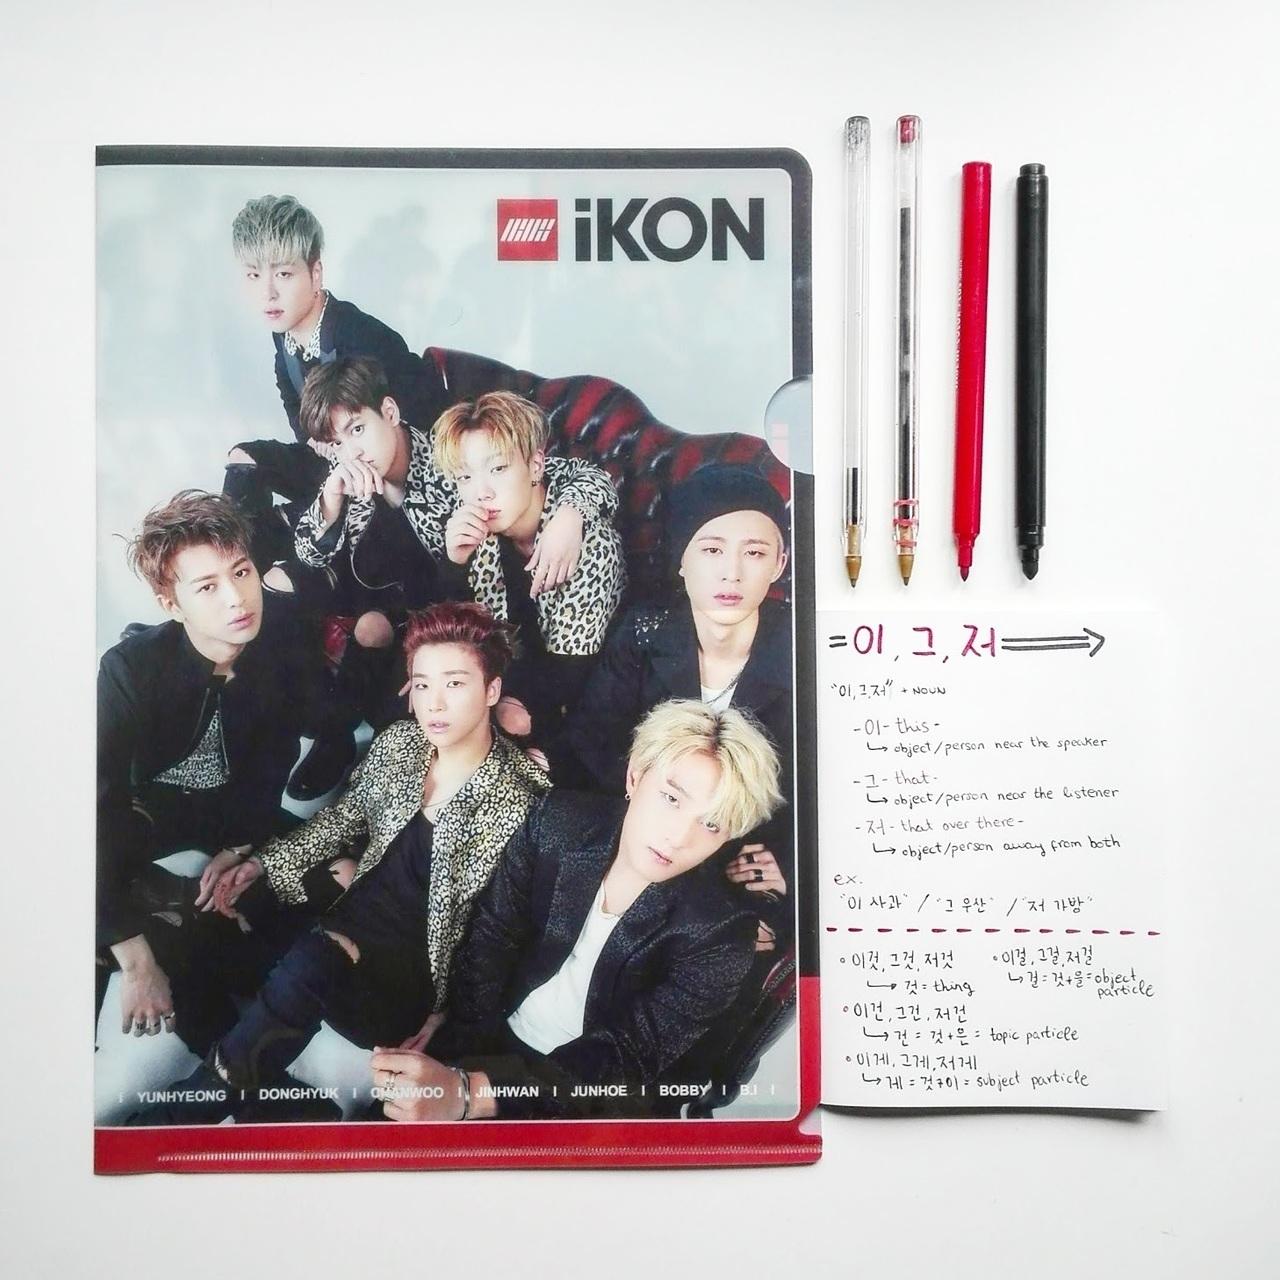 Ikon, kpop, and article image